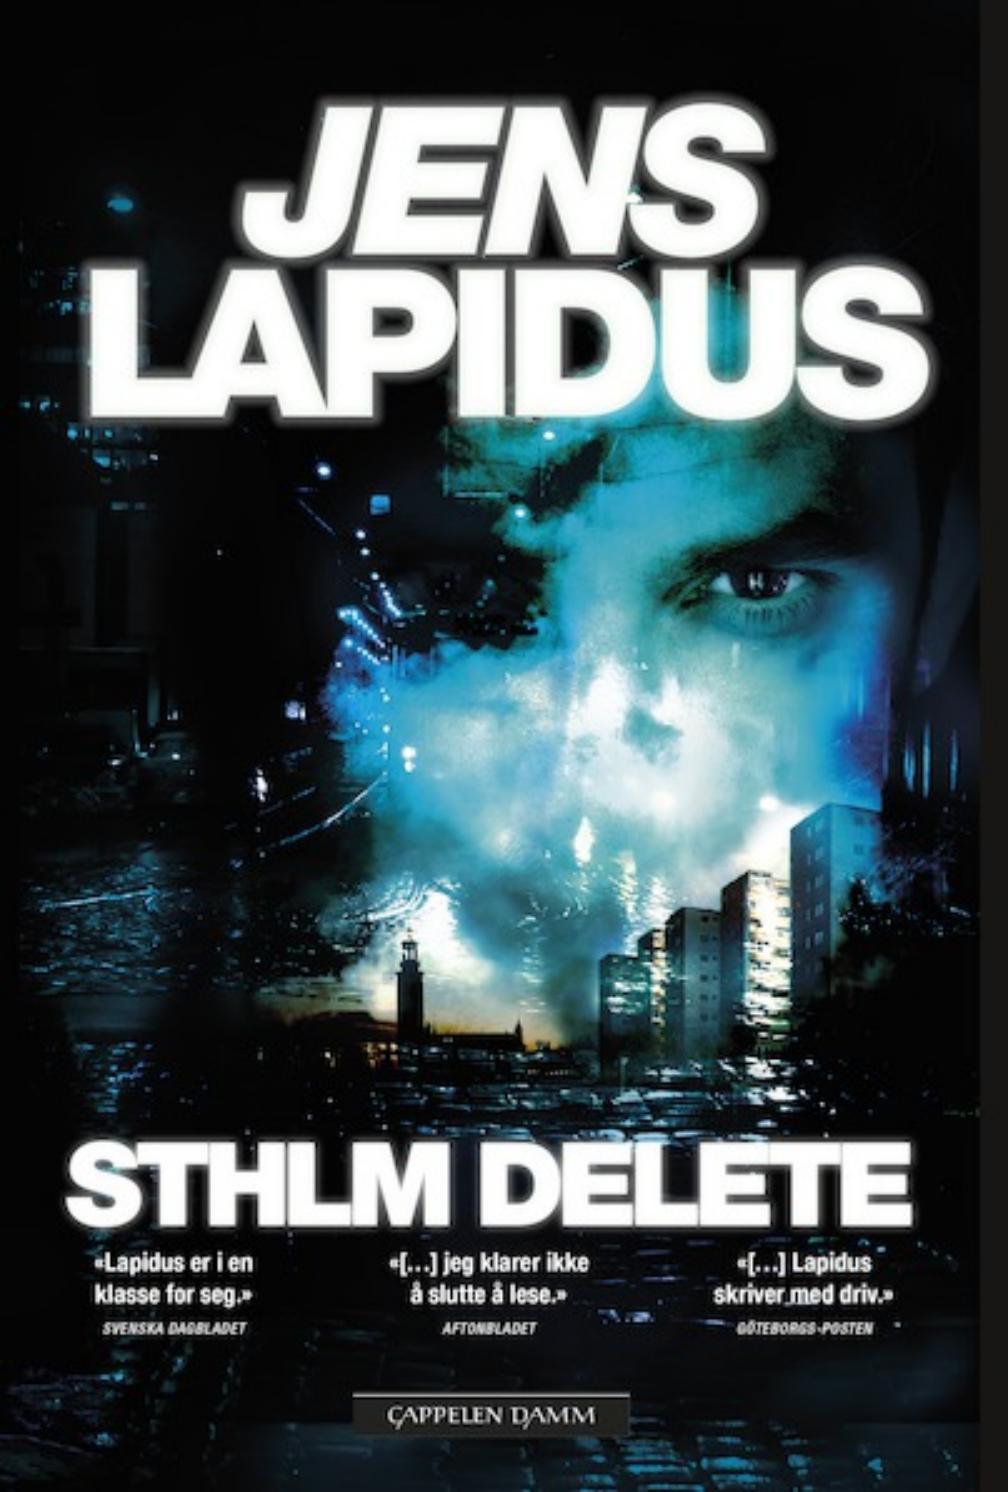 e2e2bcfb1 Jens Lapidus STHLM DELETE by Cappelen Damm AS - issuu